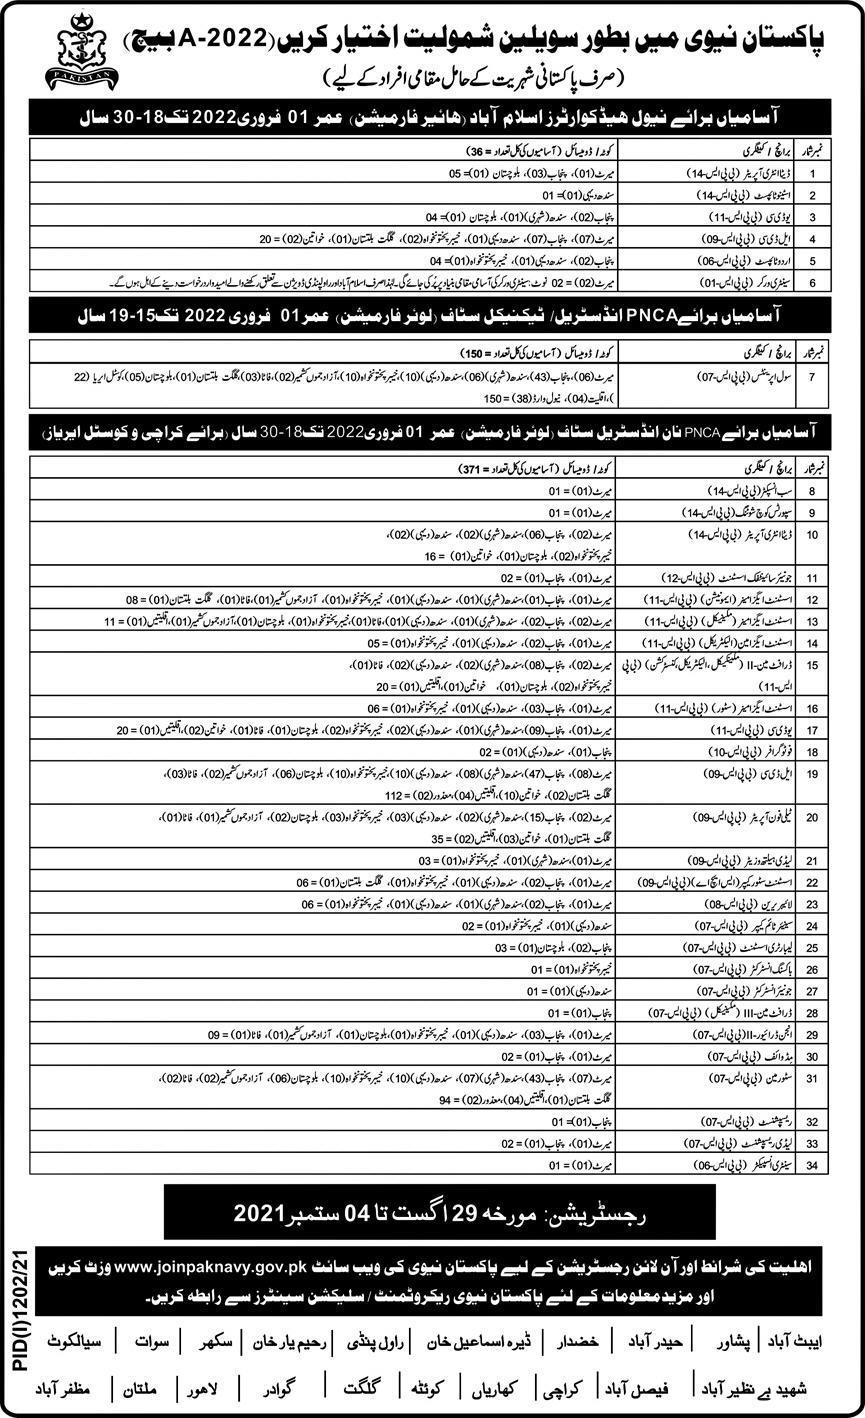 Join Pakistan Navy as Civilian Jobs 2021 – Online Registration